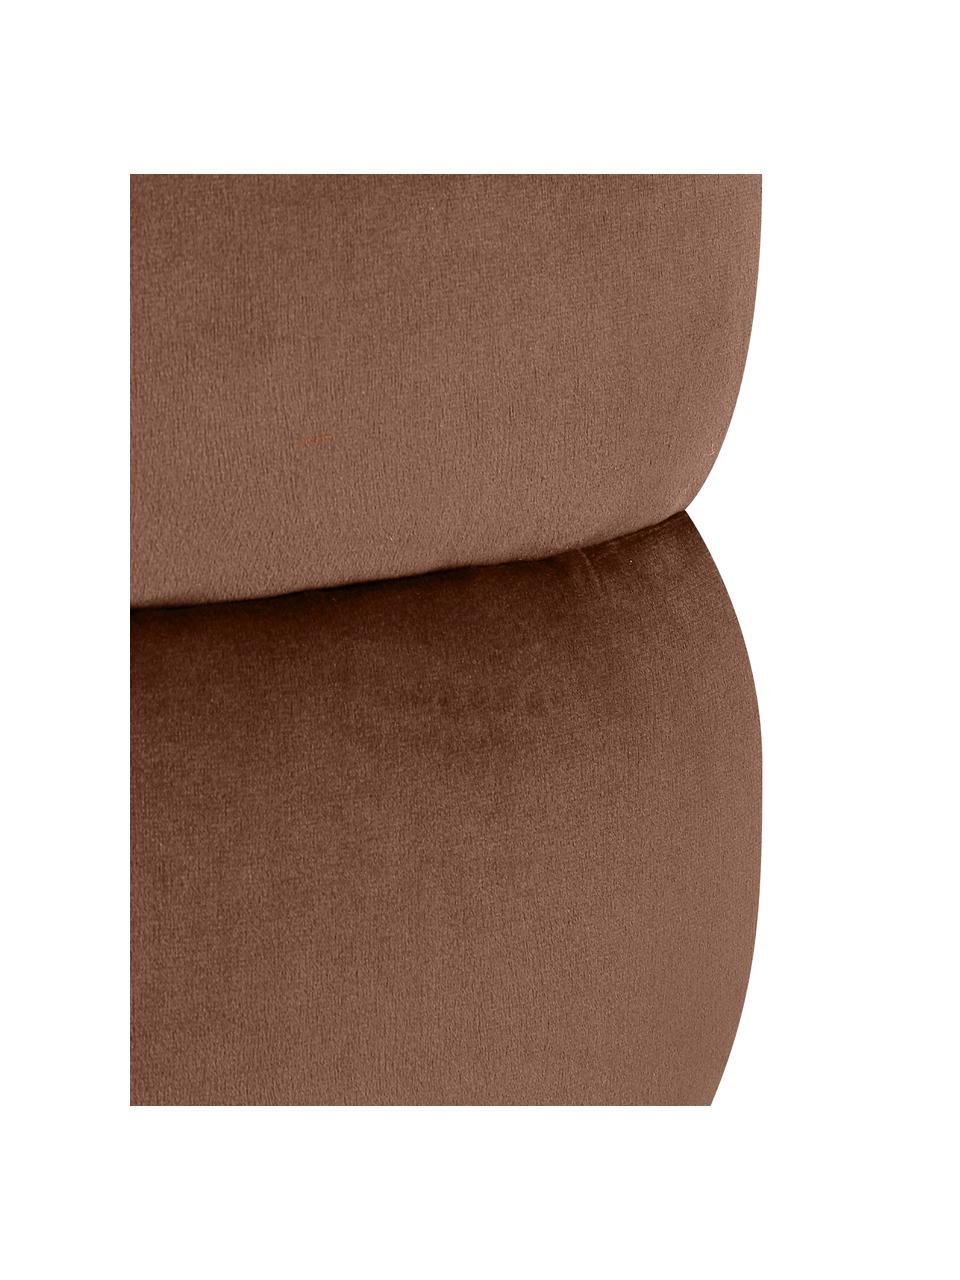 Samt-Hocker Alto in Braun, Bezug: Samt (100% Polyester) Der, Gestell: Massives Kiefernholz, Spe, Samt Braun, Ø 42 x H 47 cm